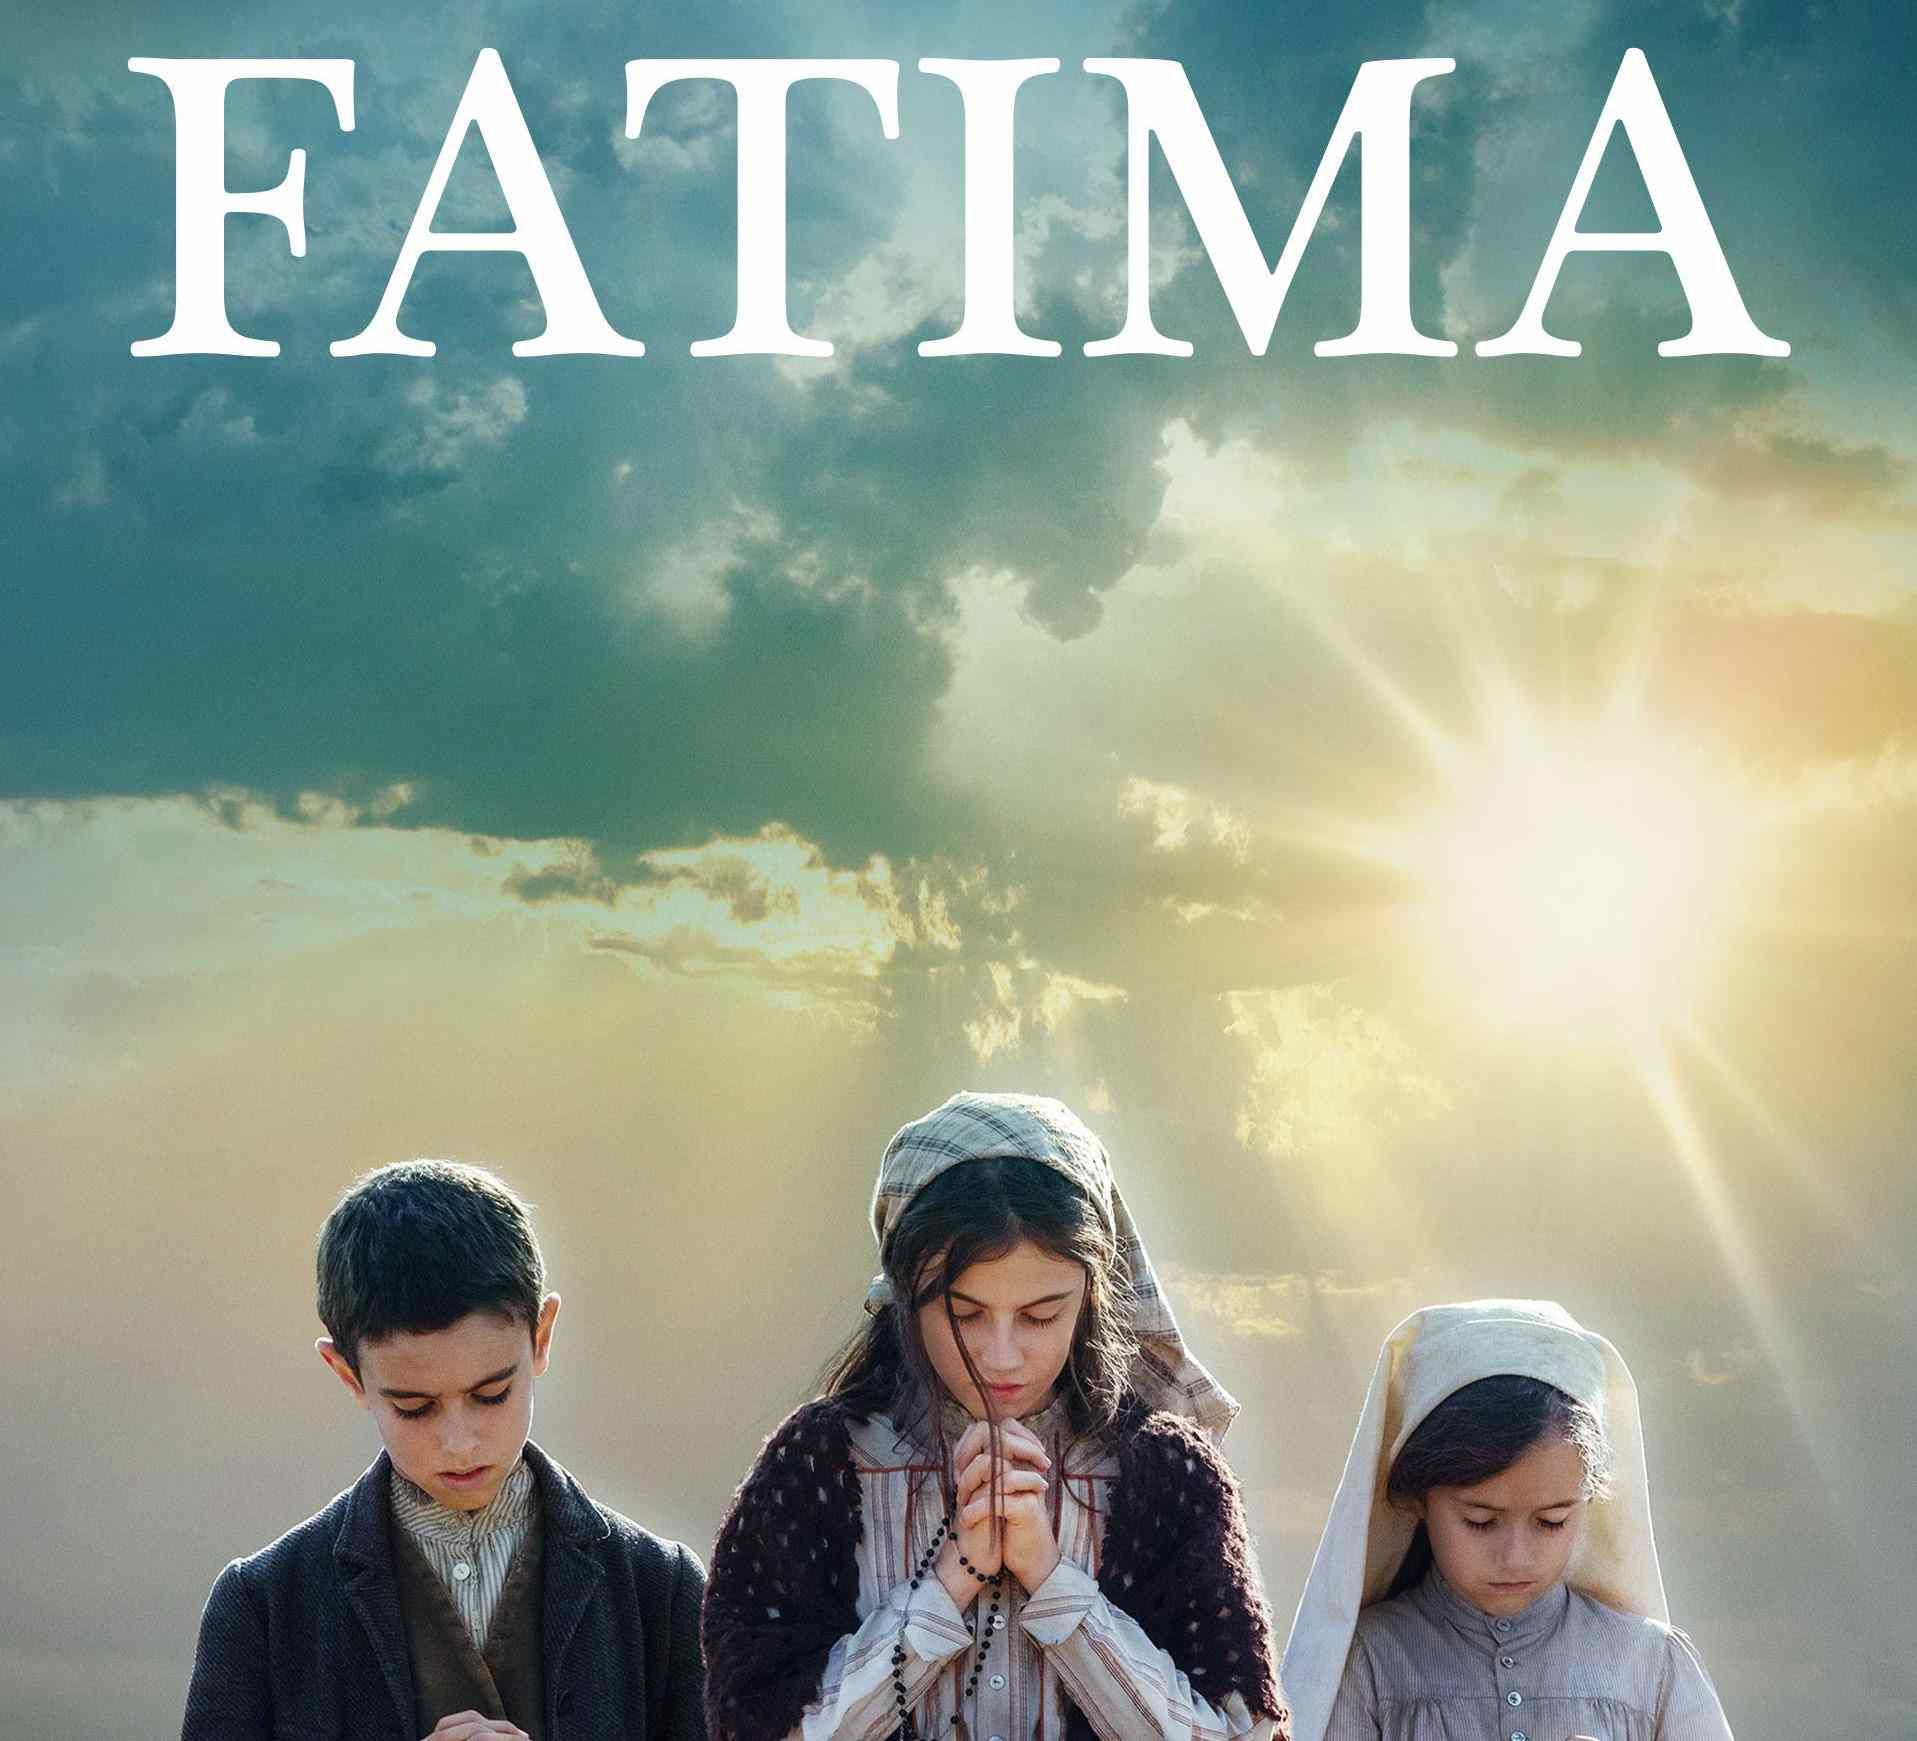 The cast of Fatima (2020)